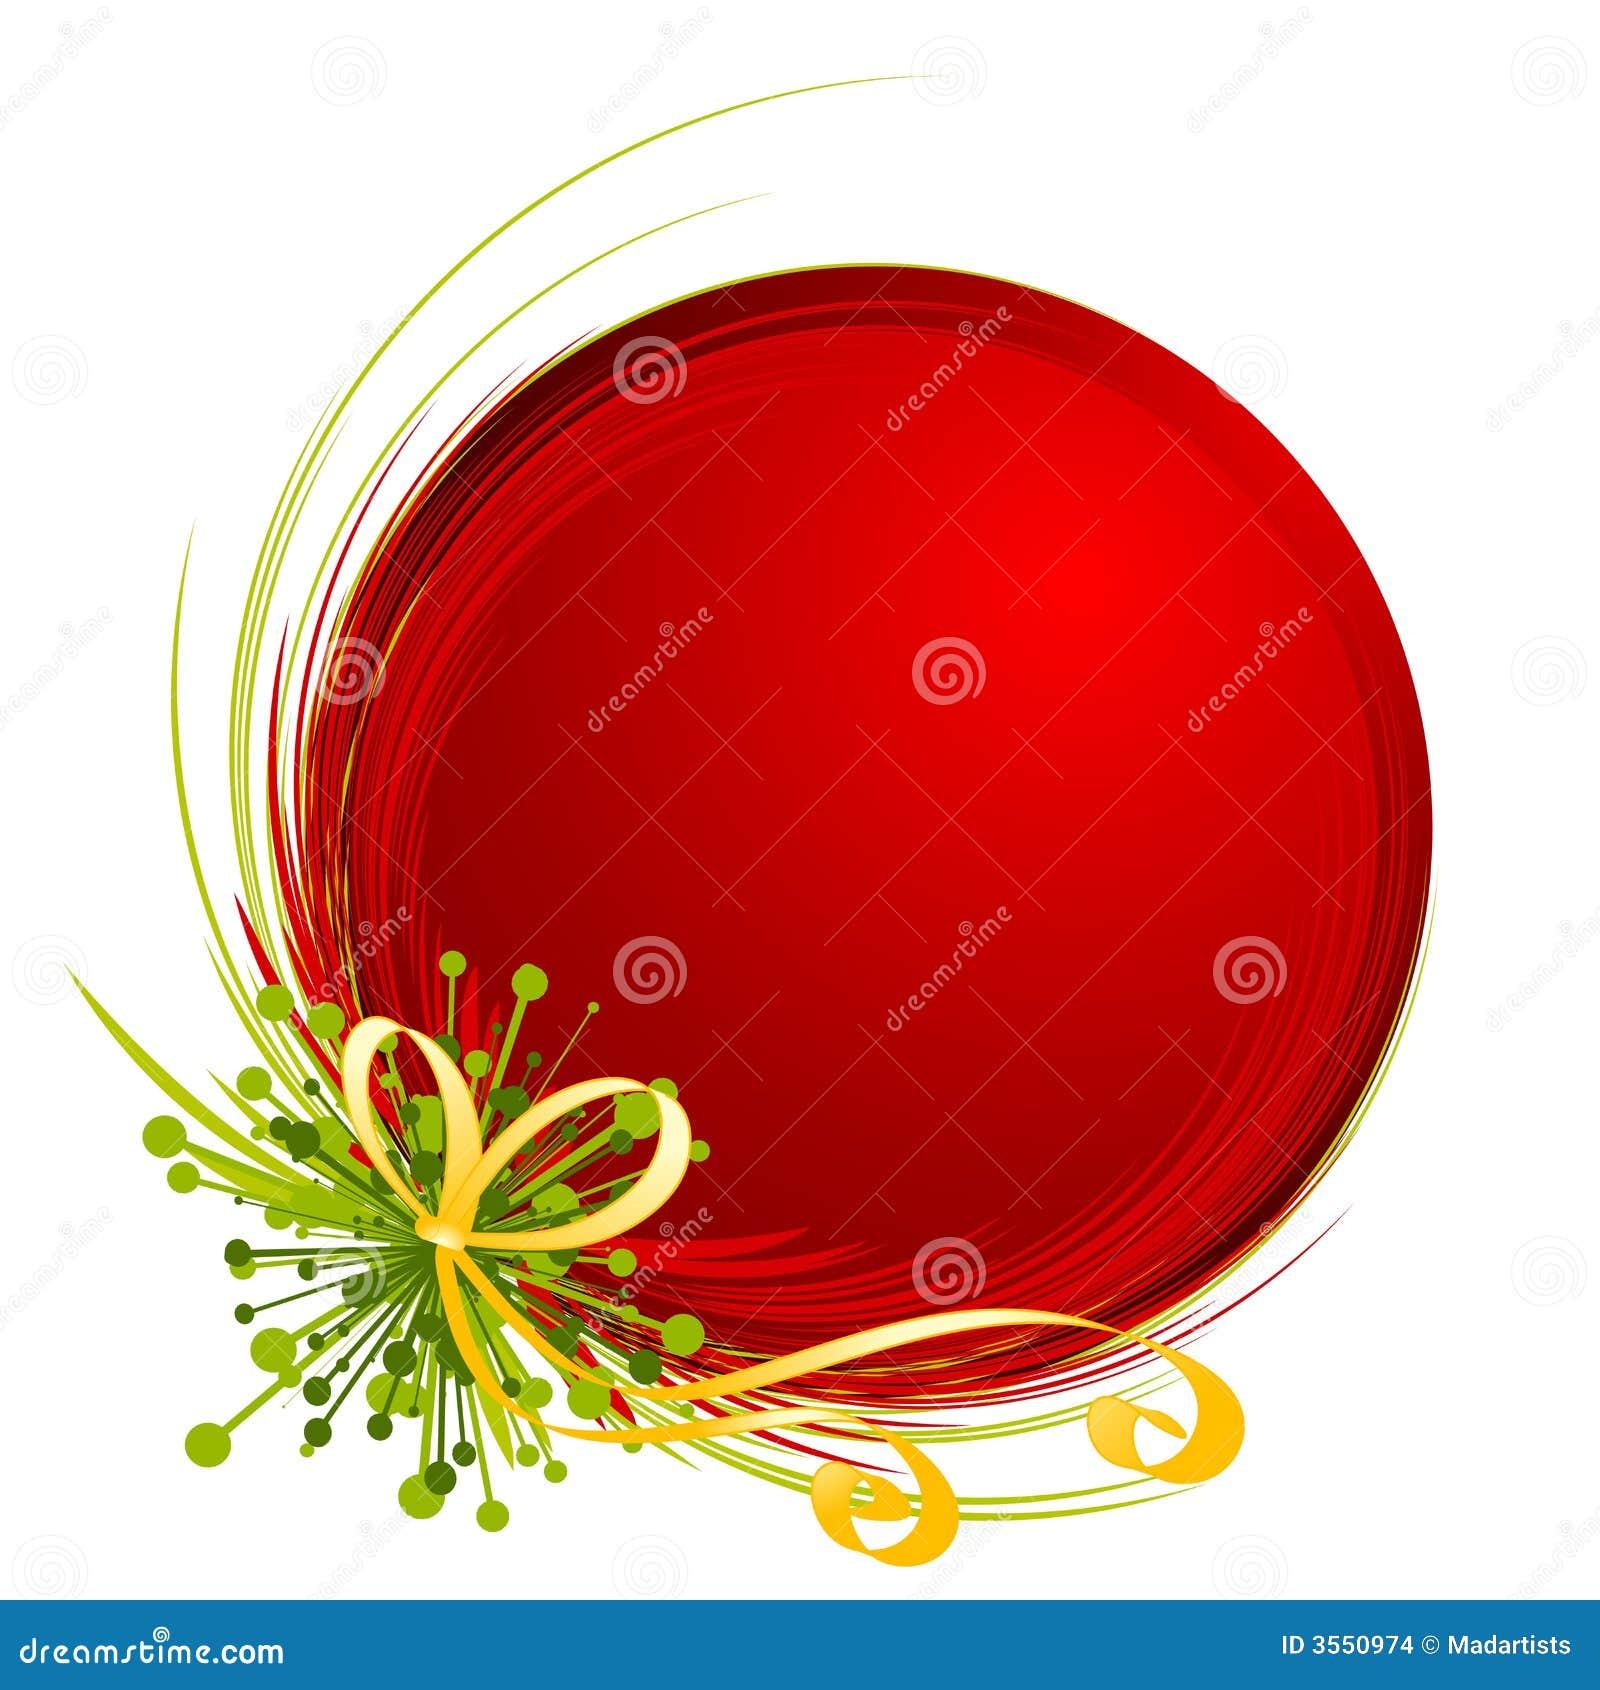 clip art illustration featuring a unique Christmas ornament ...